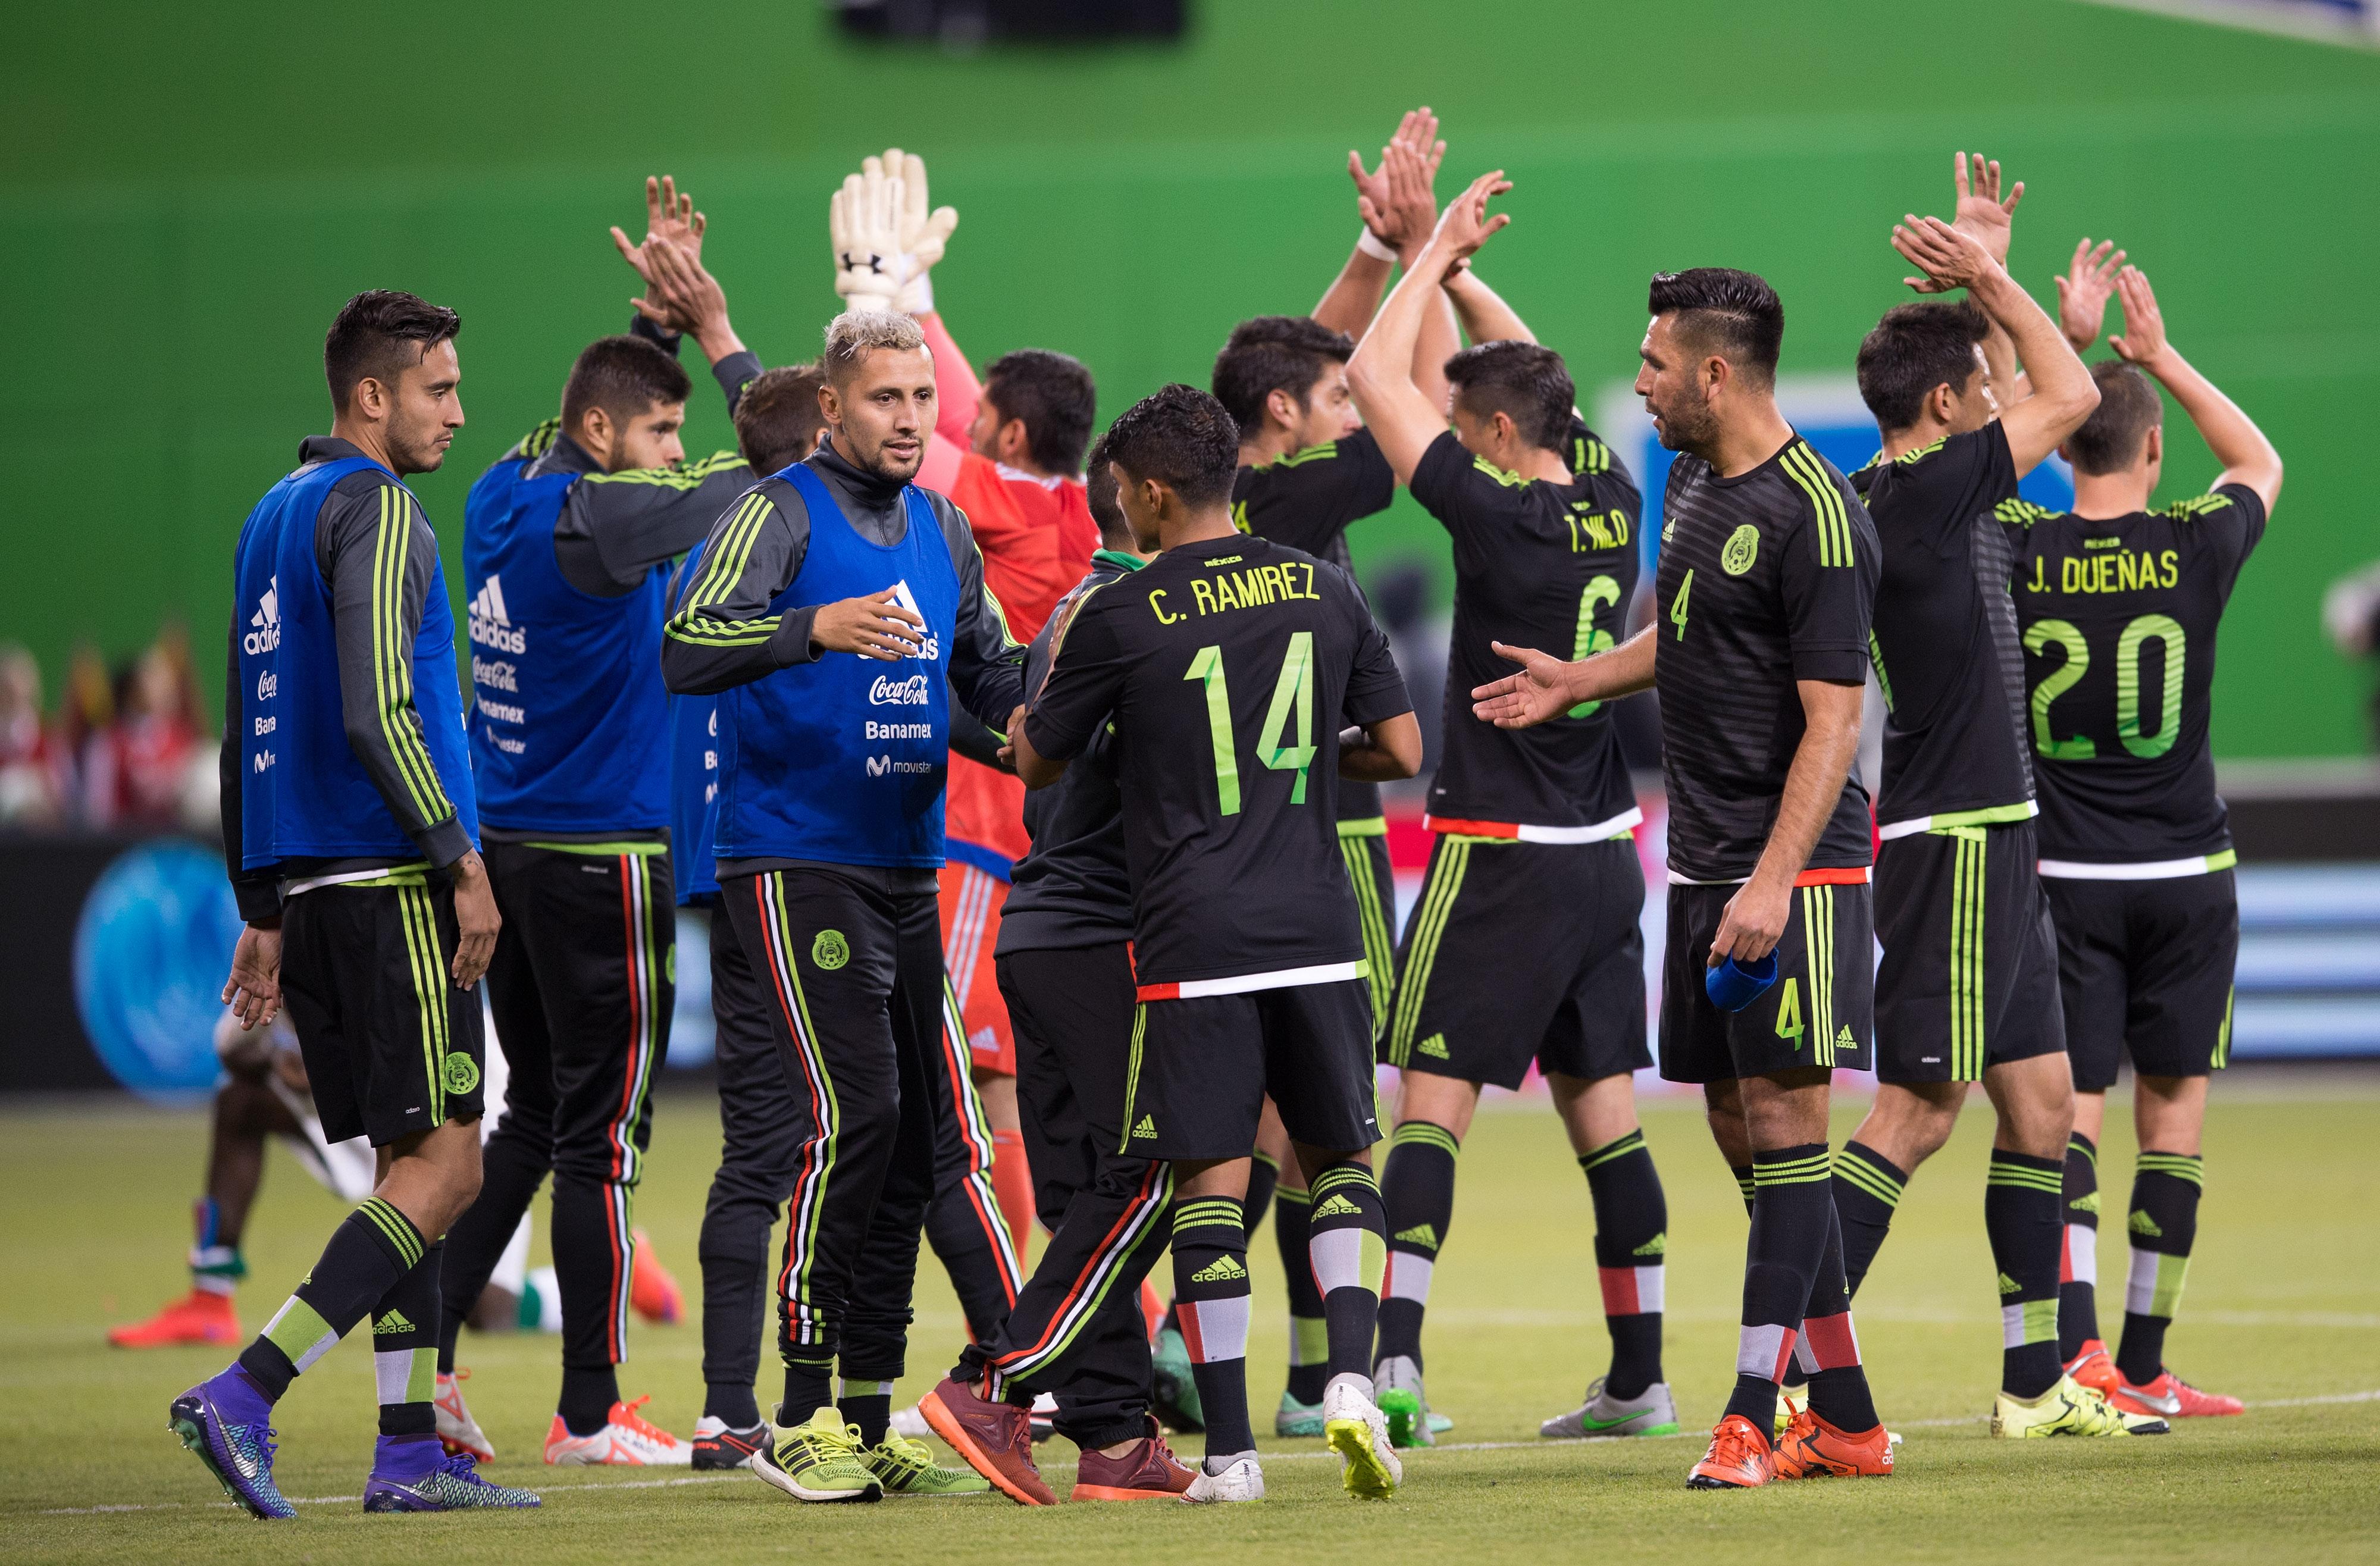 México venció a Senegal y calificamos a los jugadores del Tri